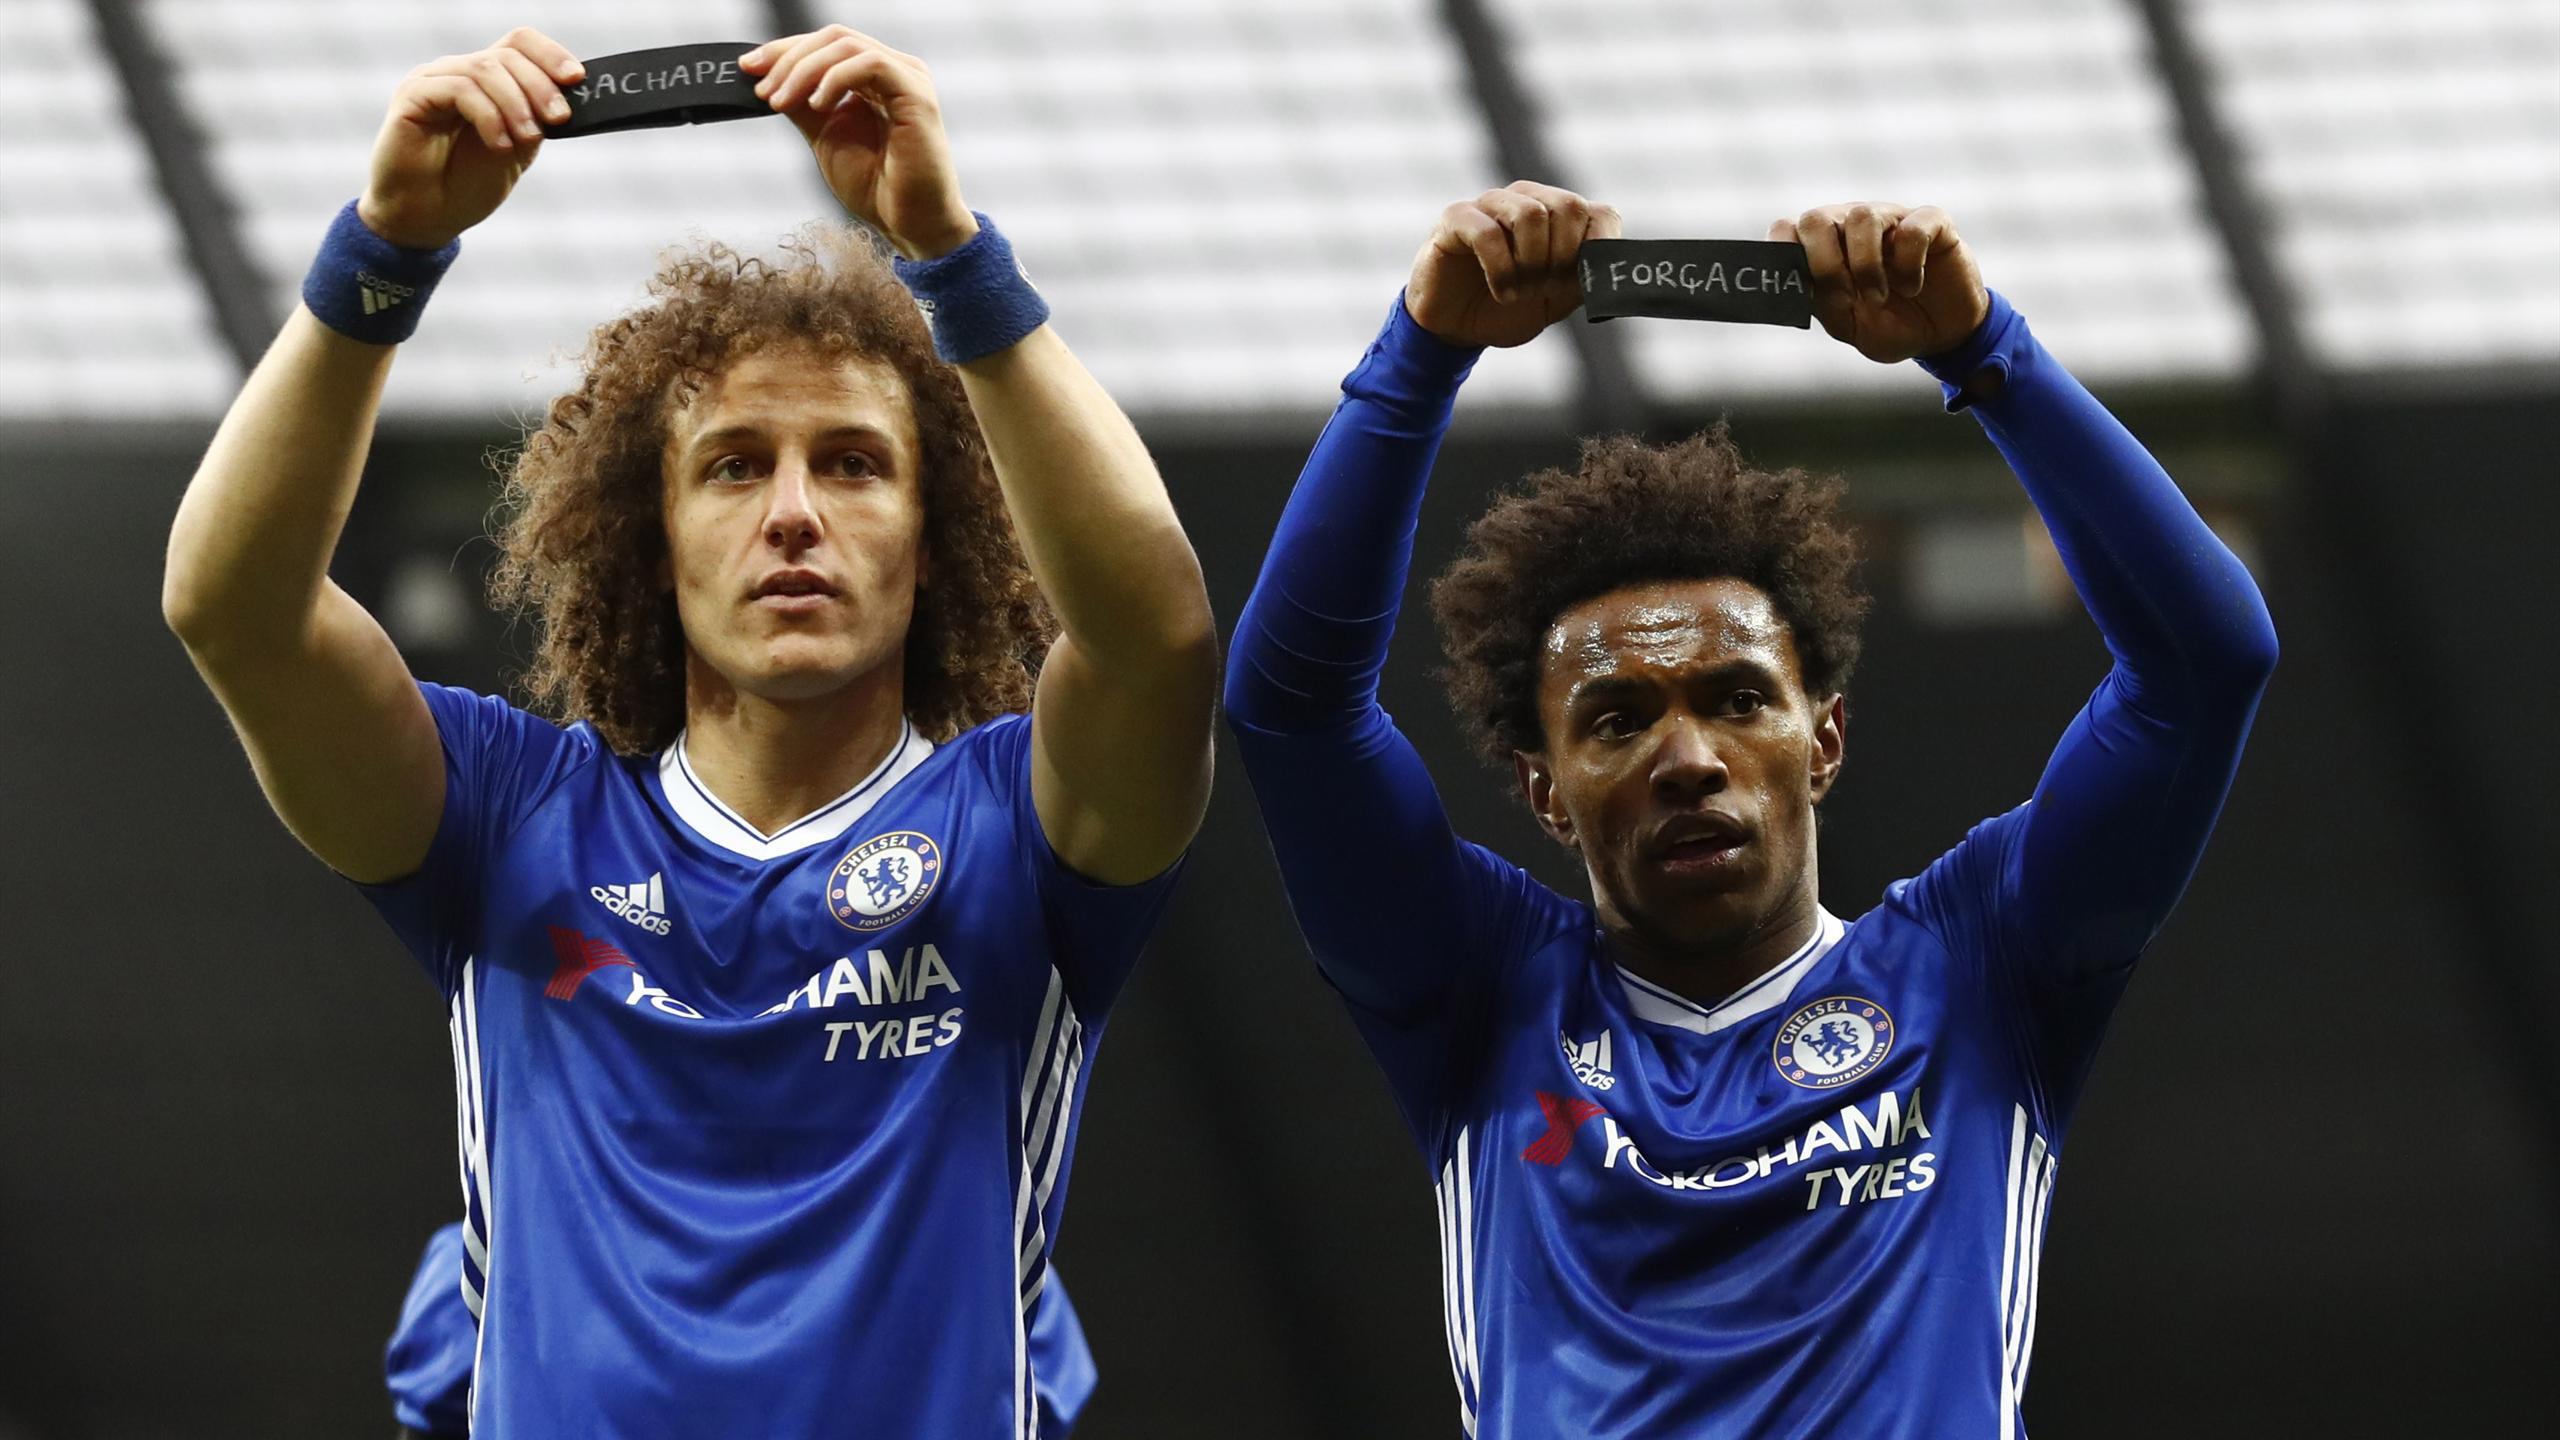 Willian and David Luiz pay tribute to Chapecoense players